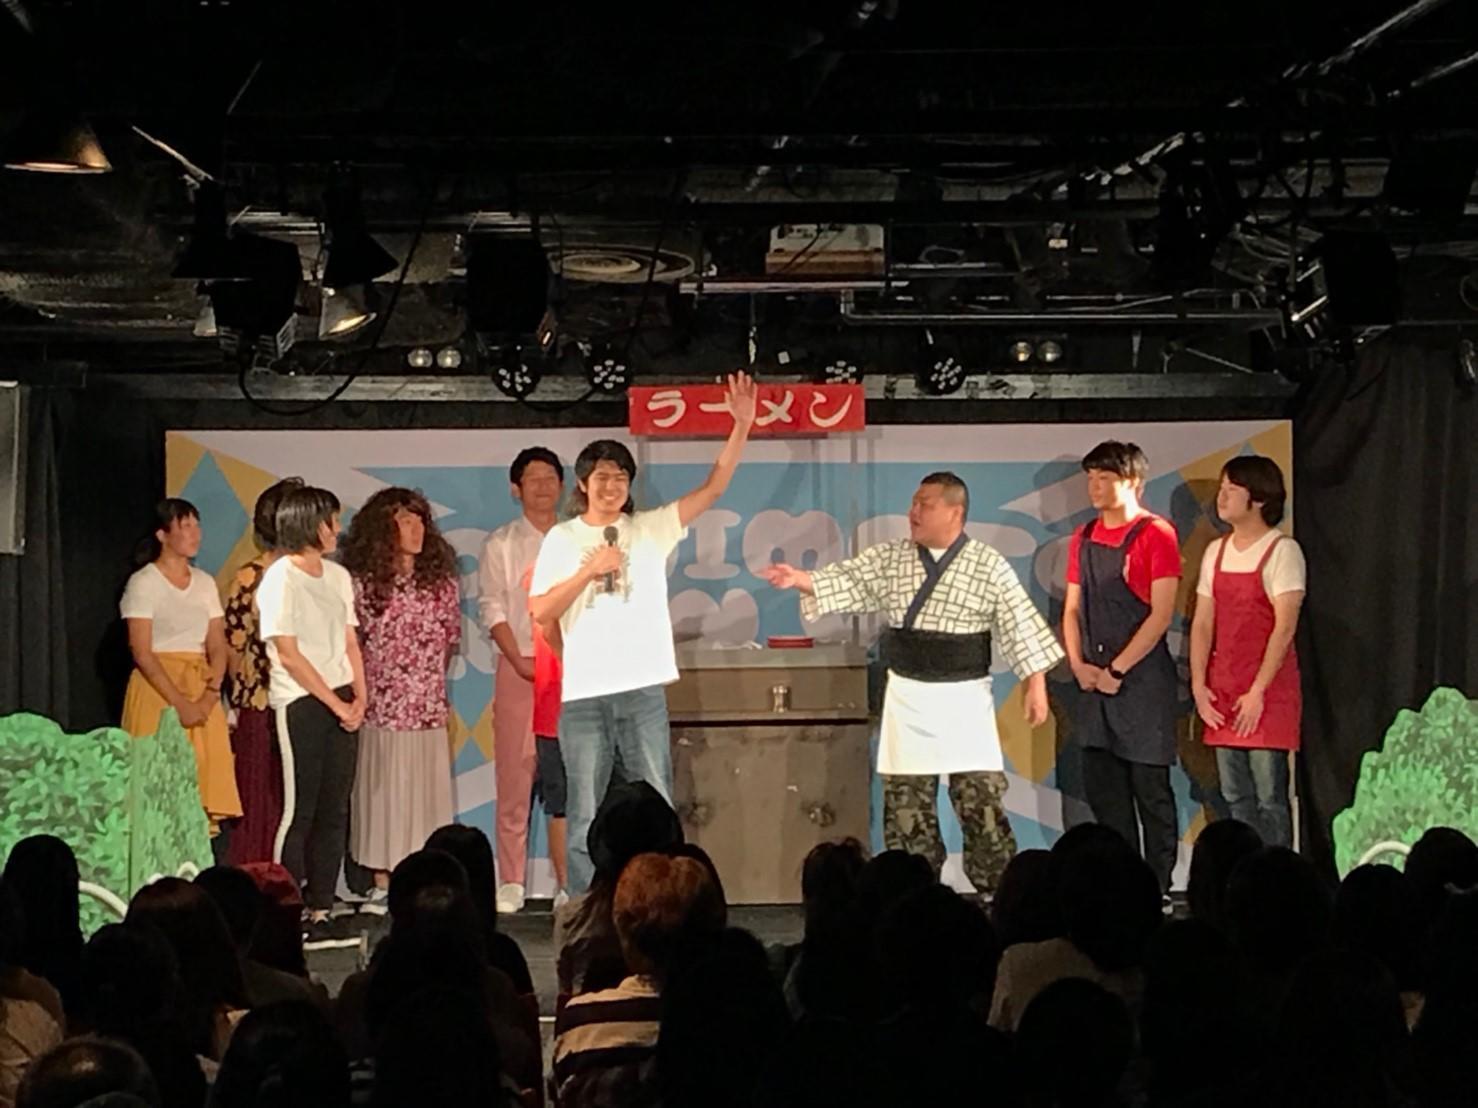 http://news.yoshimoto.co.jp/20181006175021-4e57d976bc55f682437236859f74d9e84aab752f.jpg